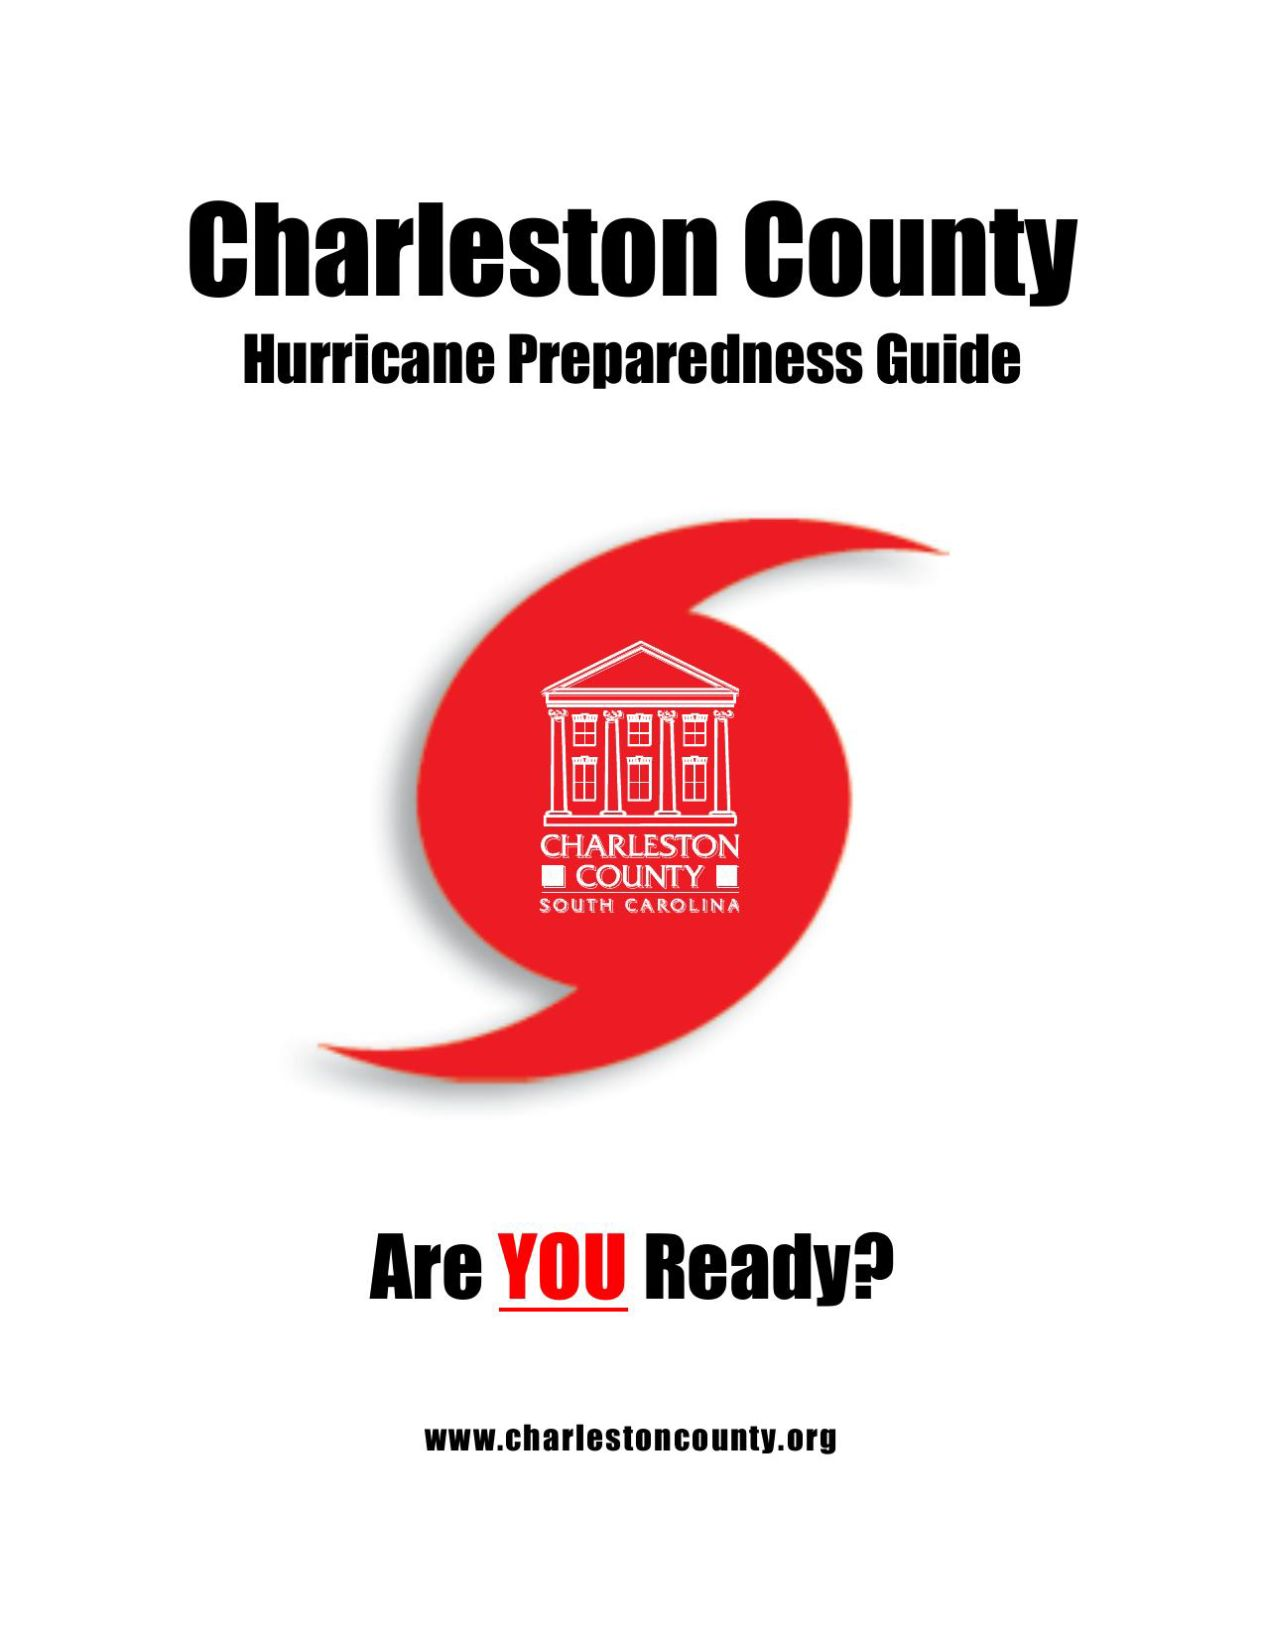 Charleston County Hurricane Preparedness Guide